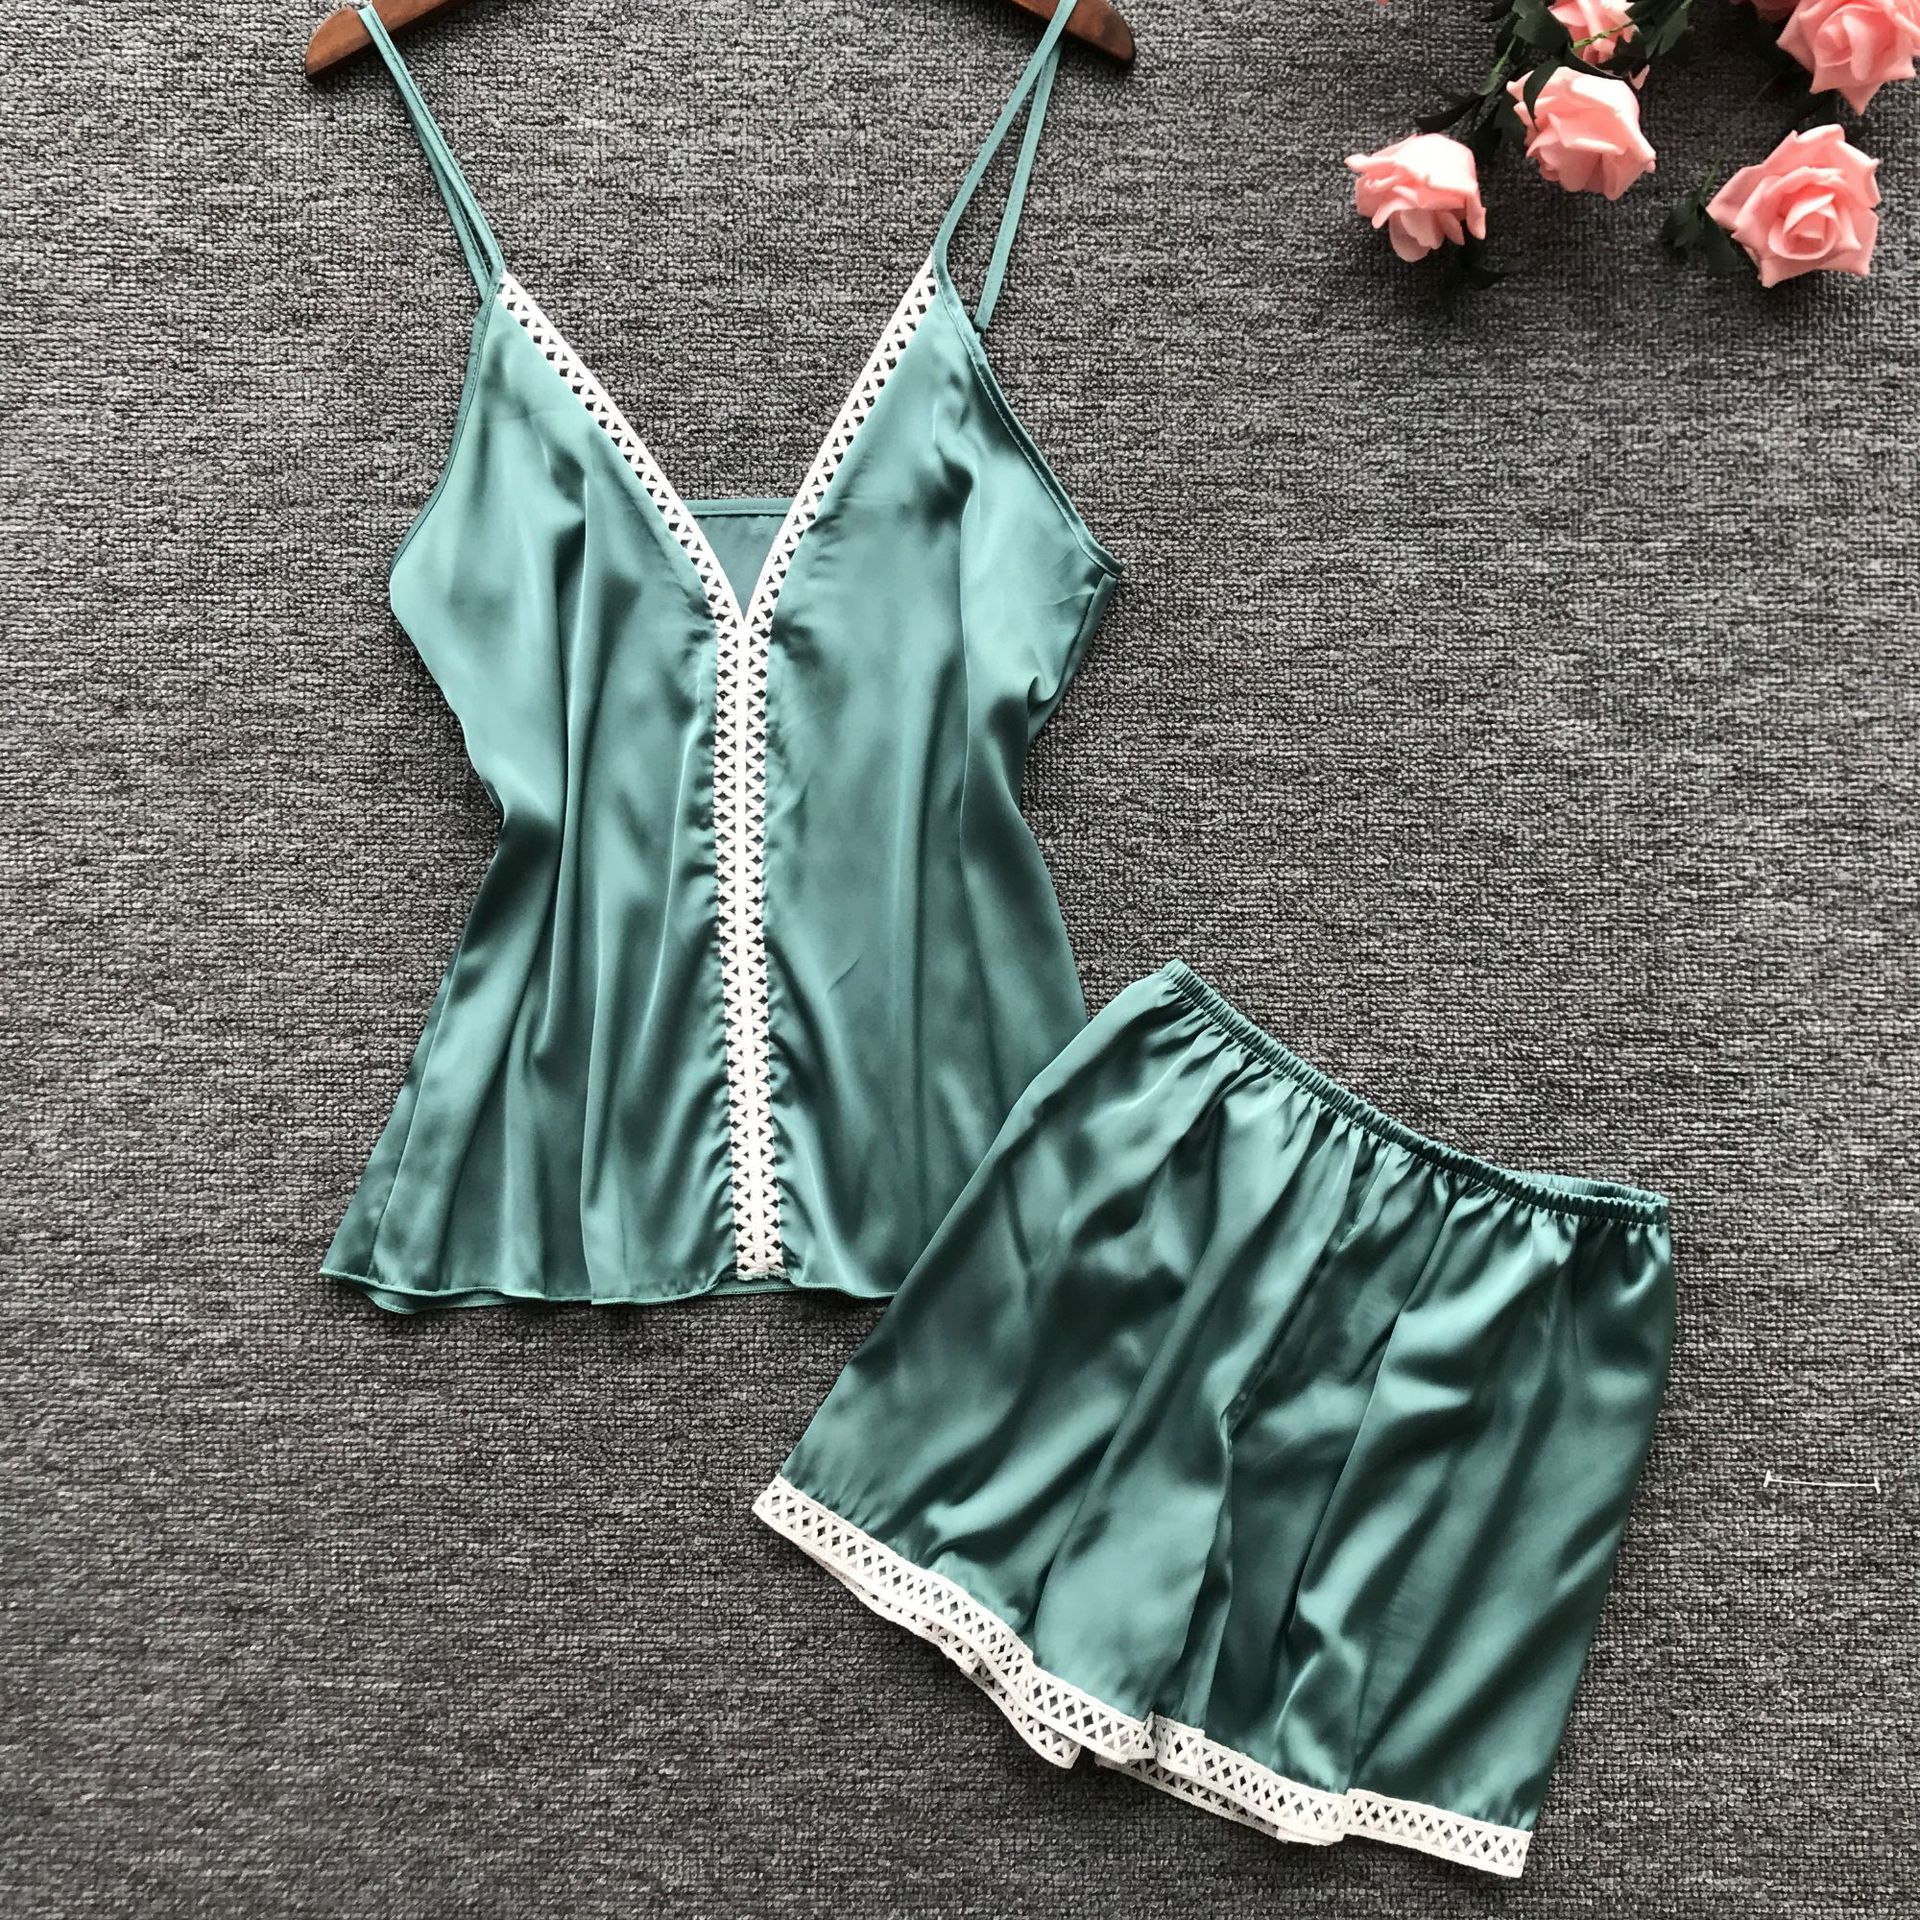 2019 Summer New Pattern Lace Patchwork Ice Silk Women Sexy Sleepwear Spaghetti Strap Shorts Pajamas